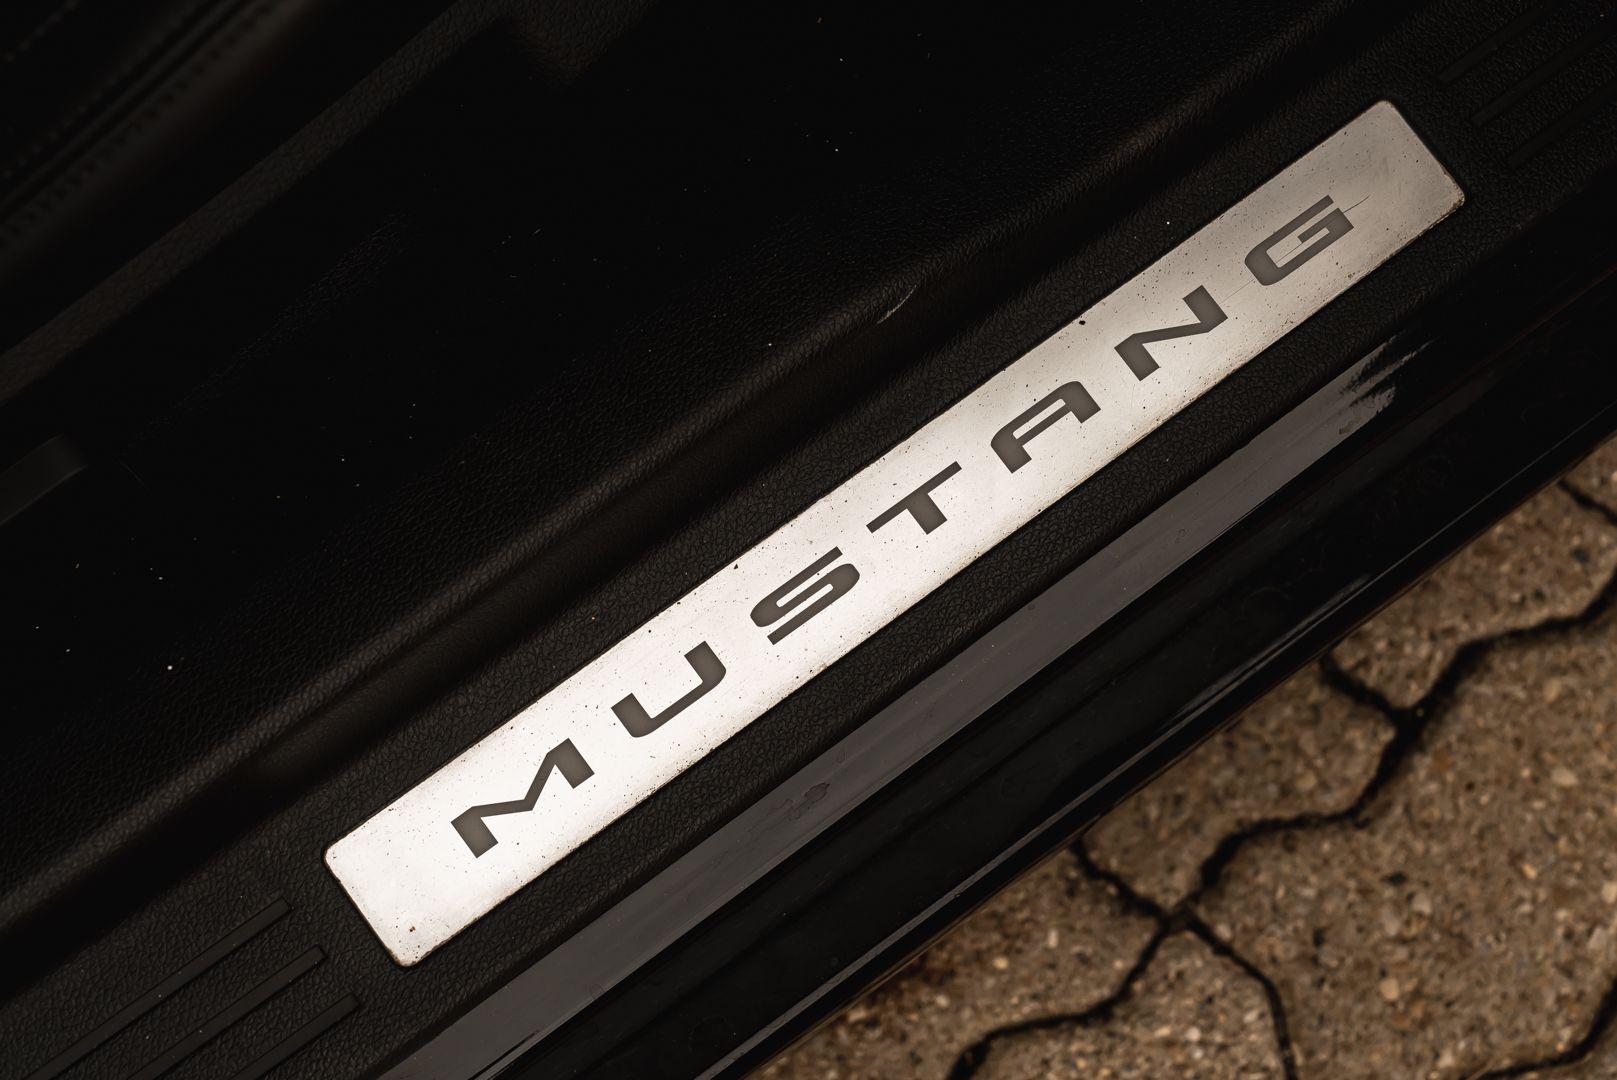 2012 Ford Mustang 5.0 V8 82086